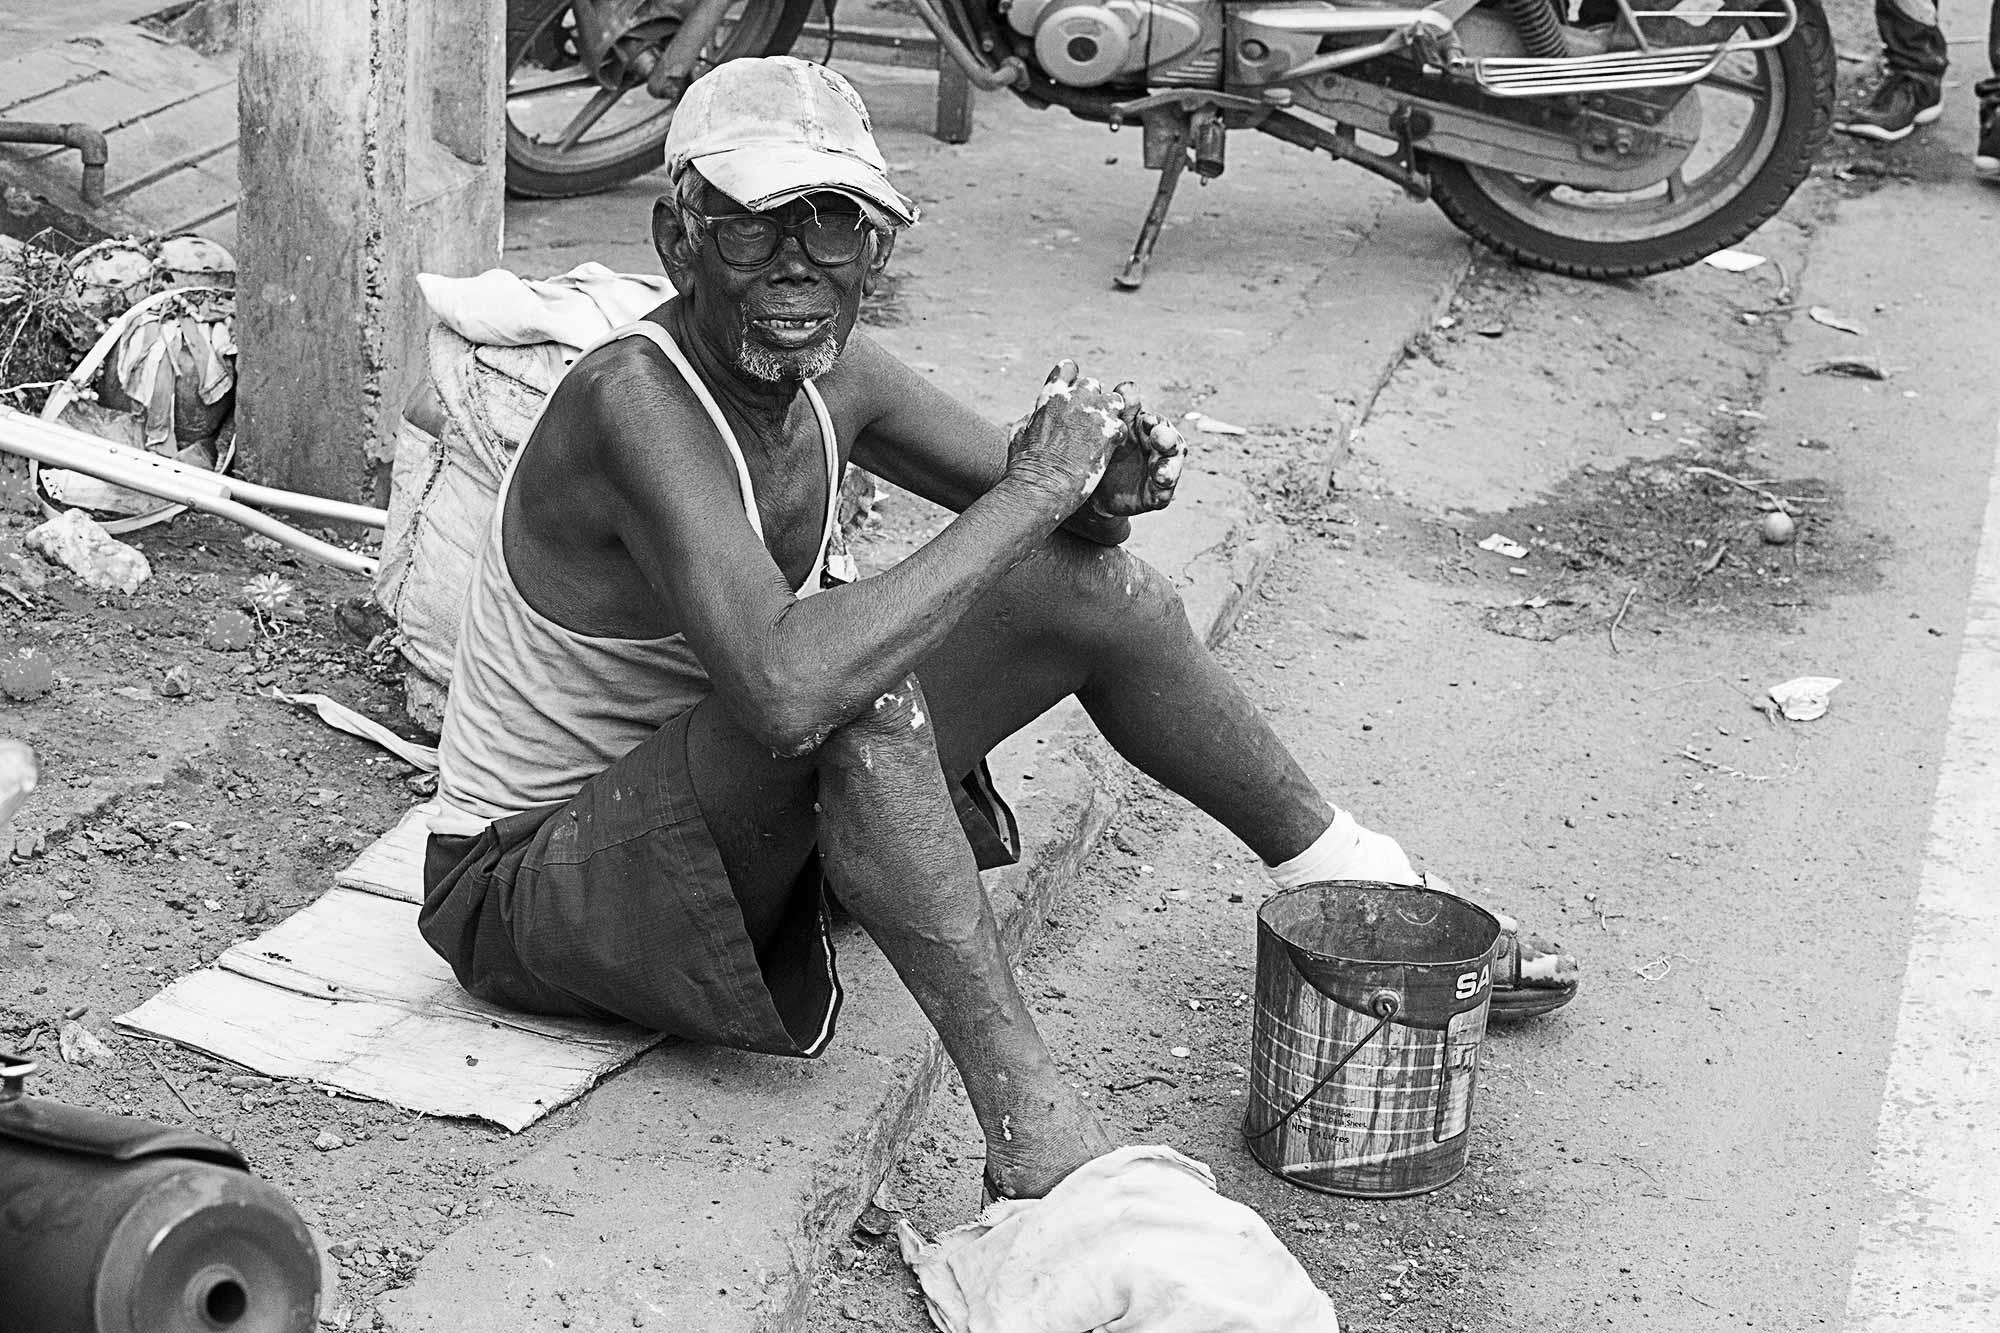 disfigured-man-visakhapatnam-india-1